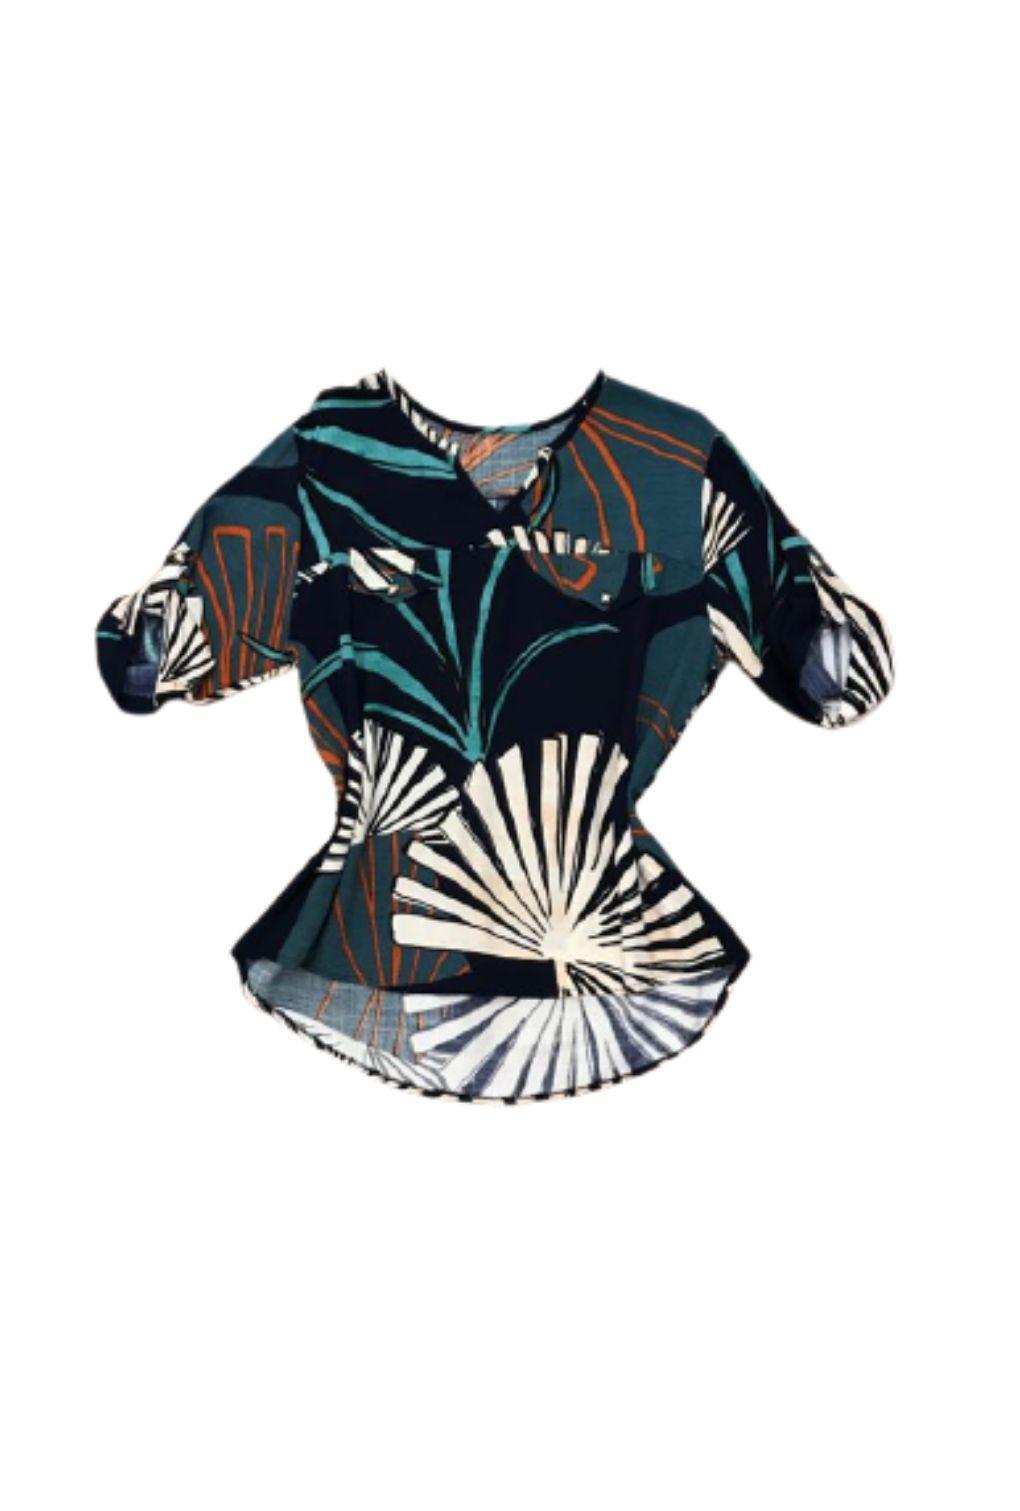 Camisa Blusa Feminina Manga Curta Social Sport Estampada Azul  - ModaStore